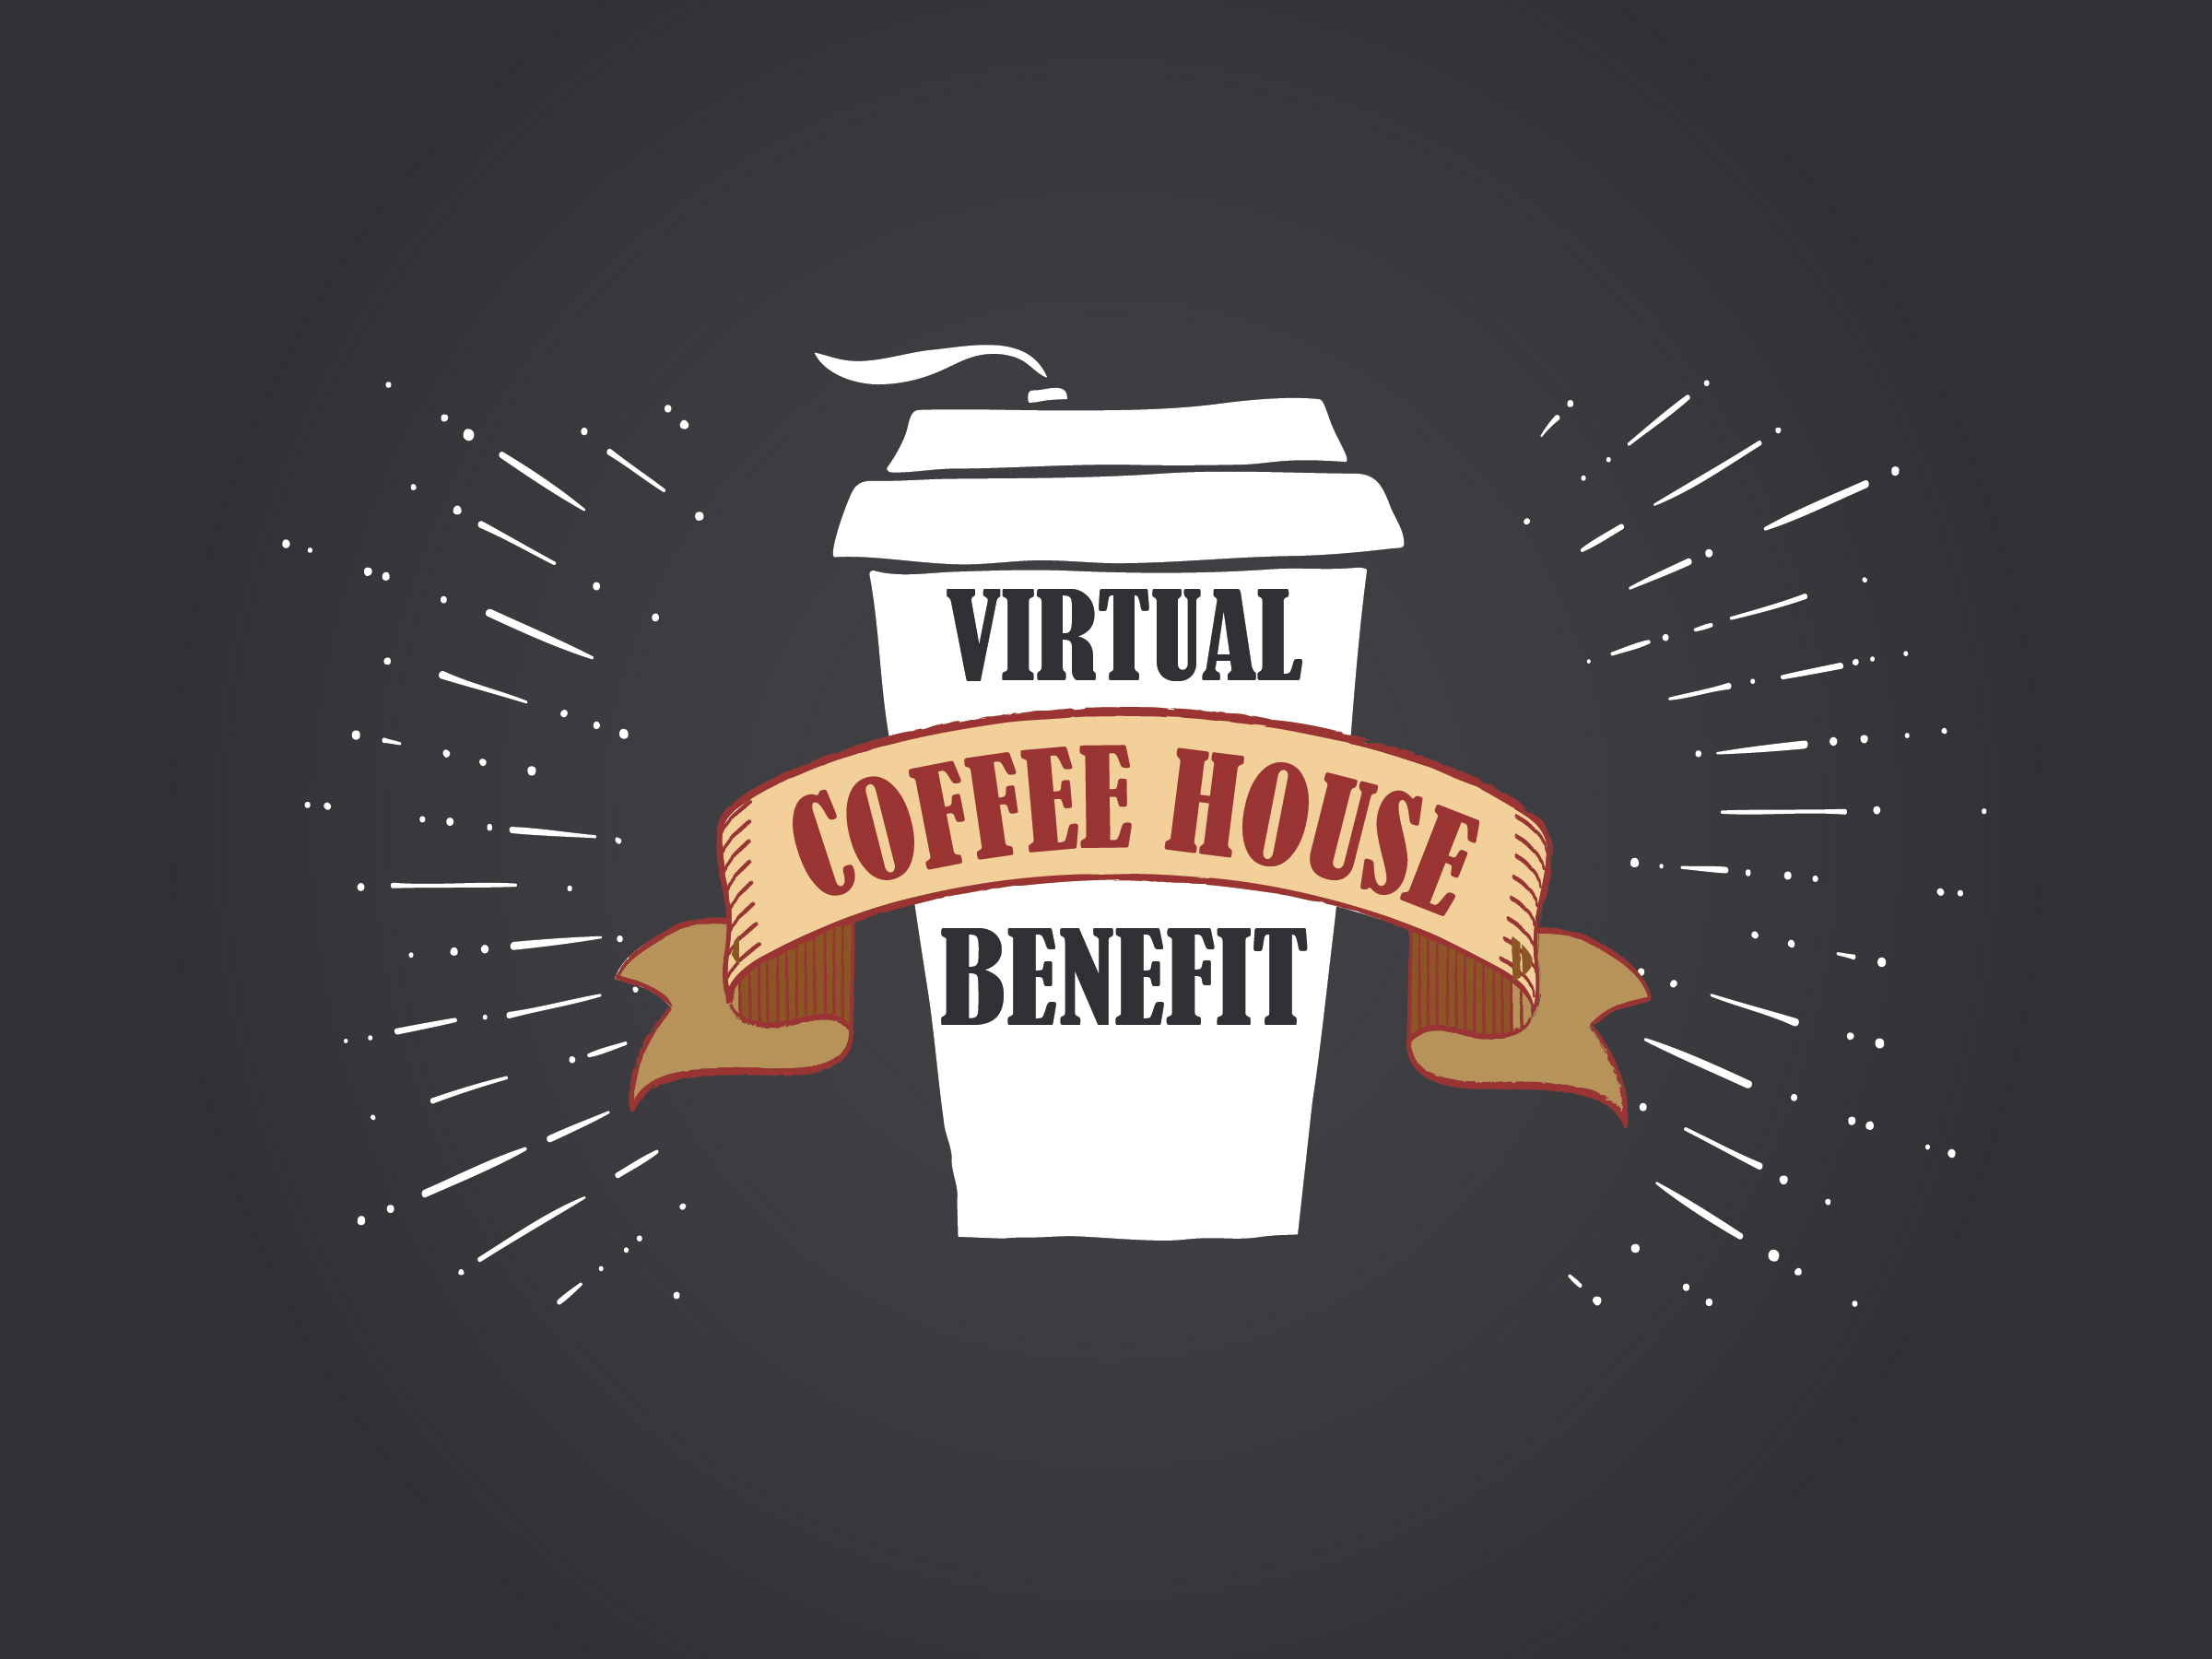 coffeehouse_benefit